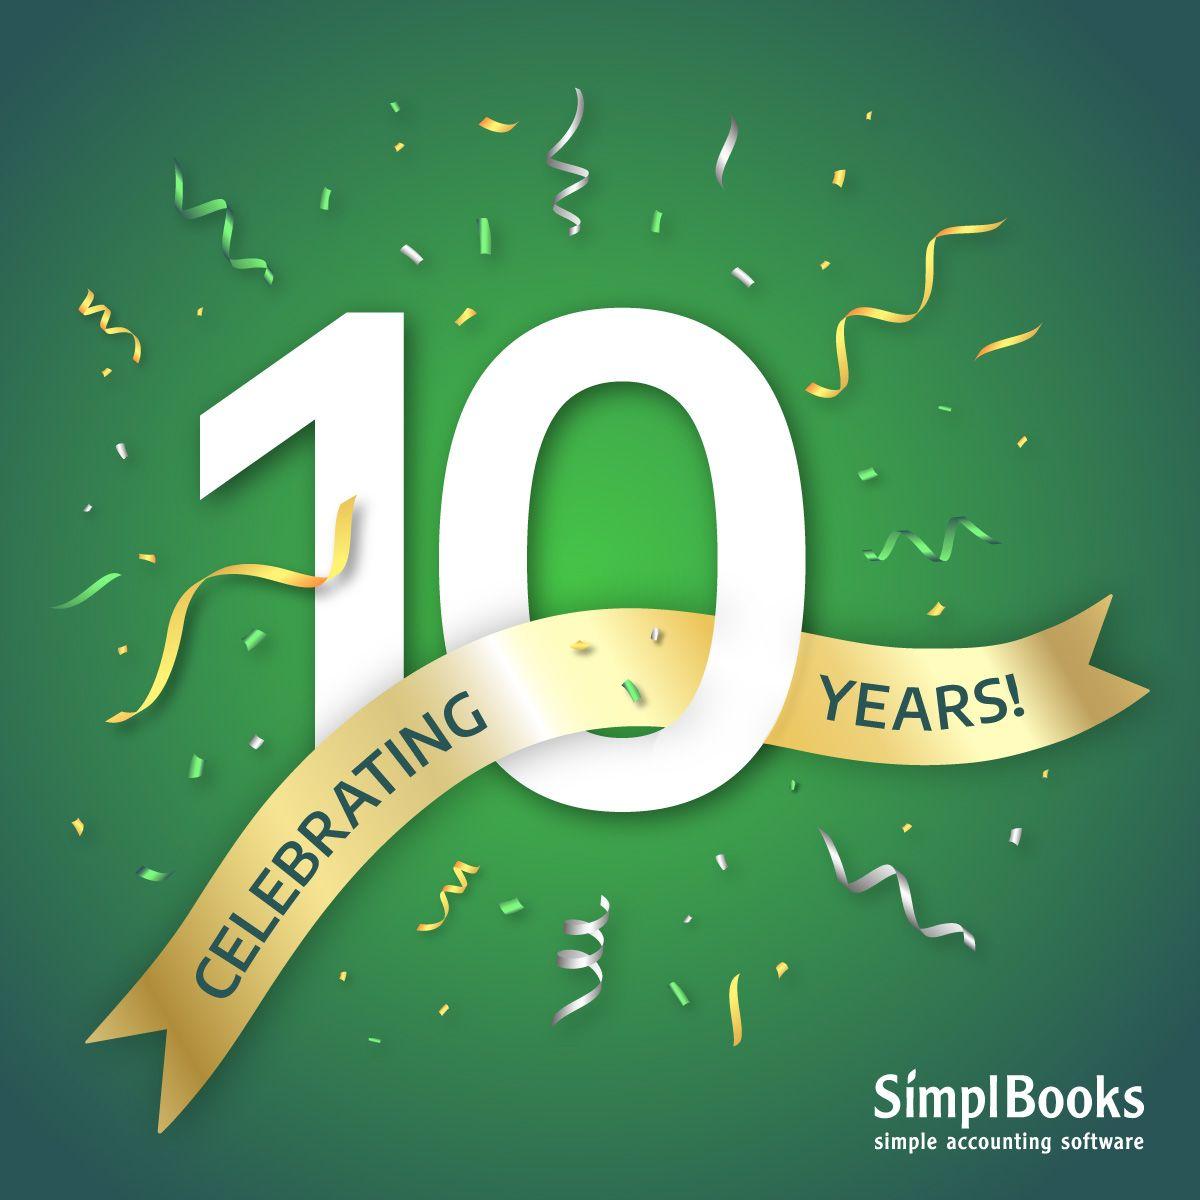 SimplBooks anniversary